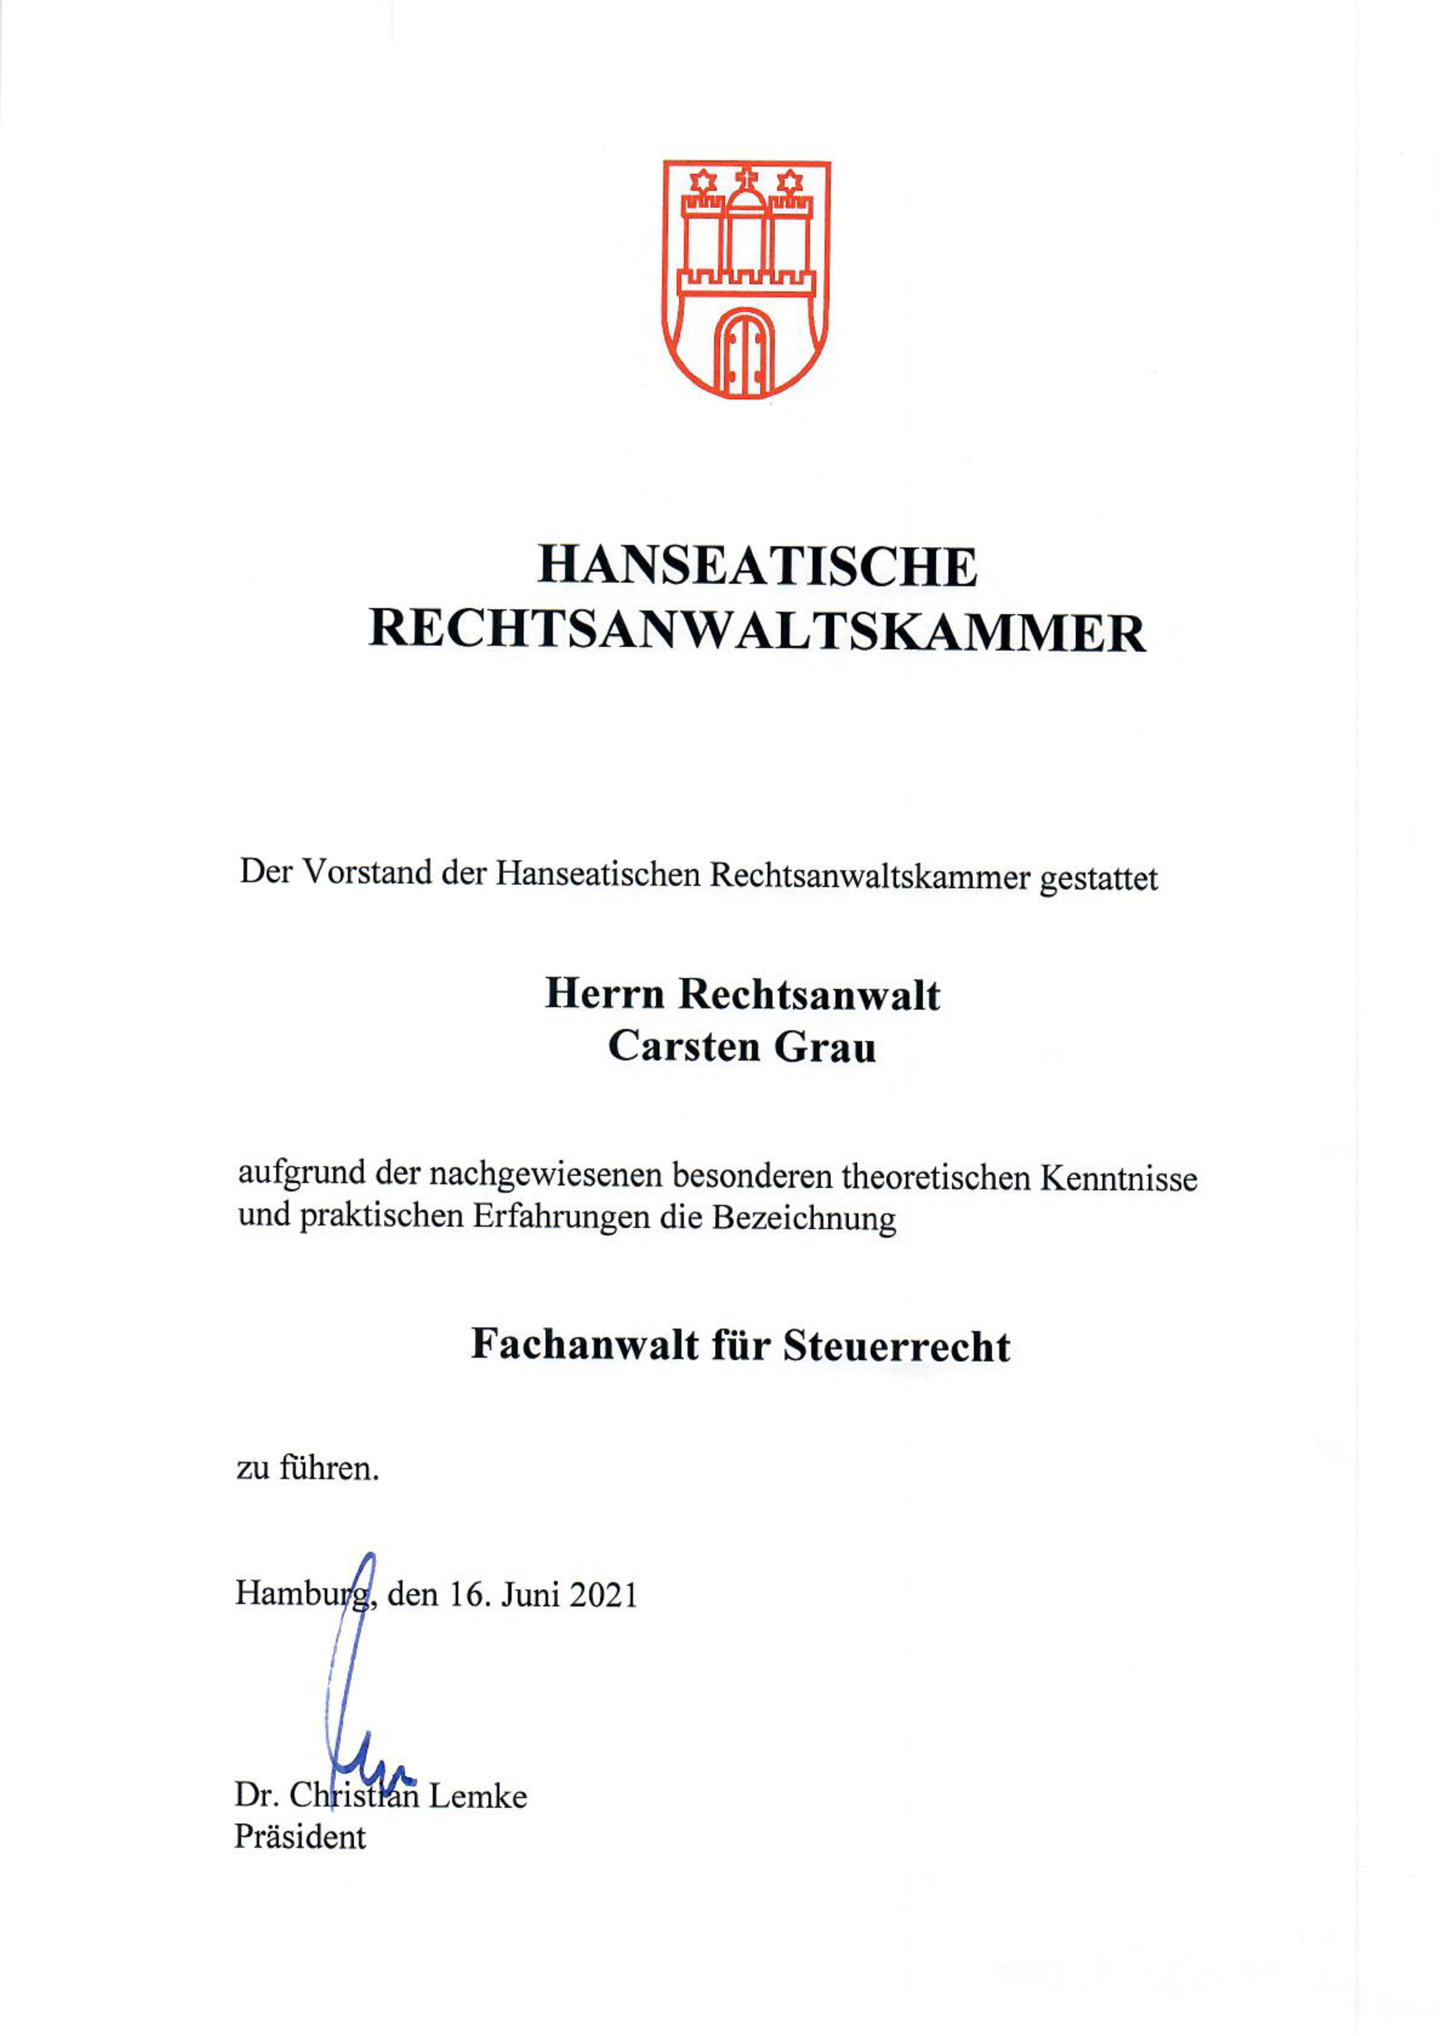 HRAK-CG-FAStR-160621